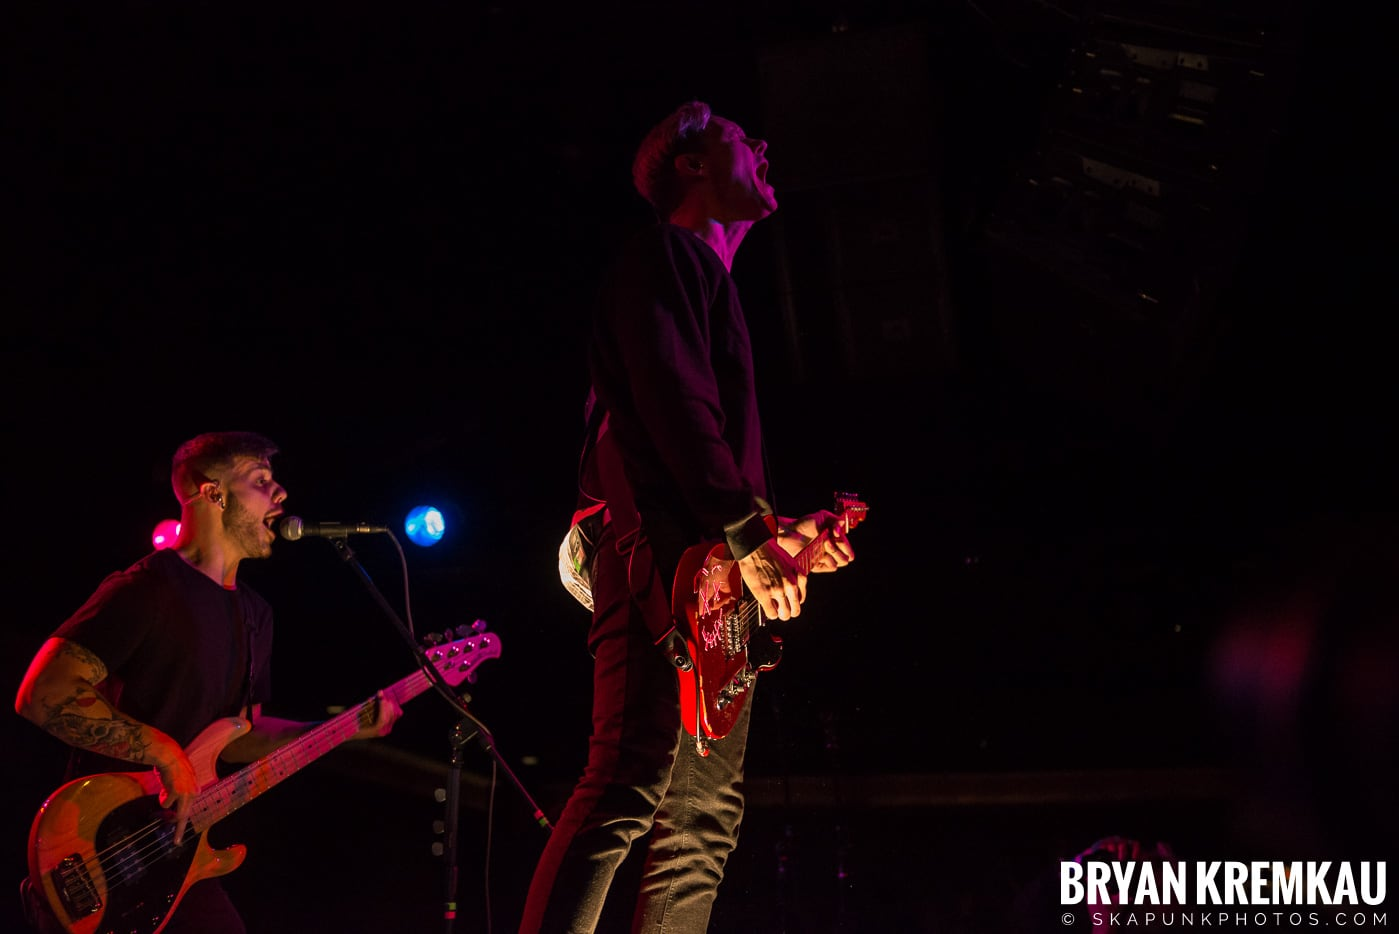 Ballyhoo! @ Starland Ballroom, Sayreville, NJ - 11.23.18 (6)